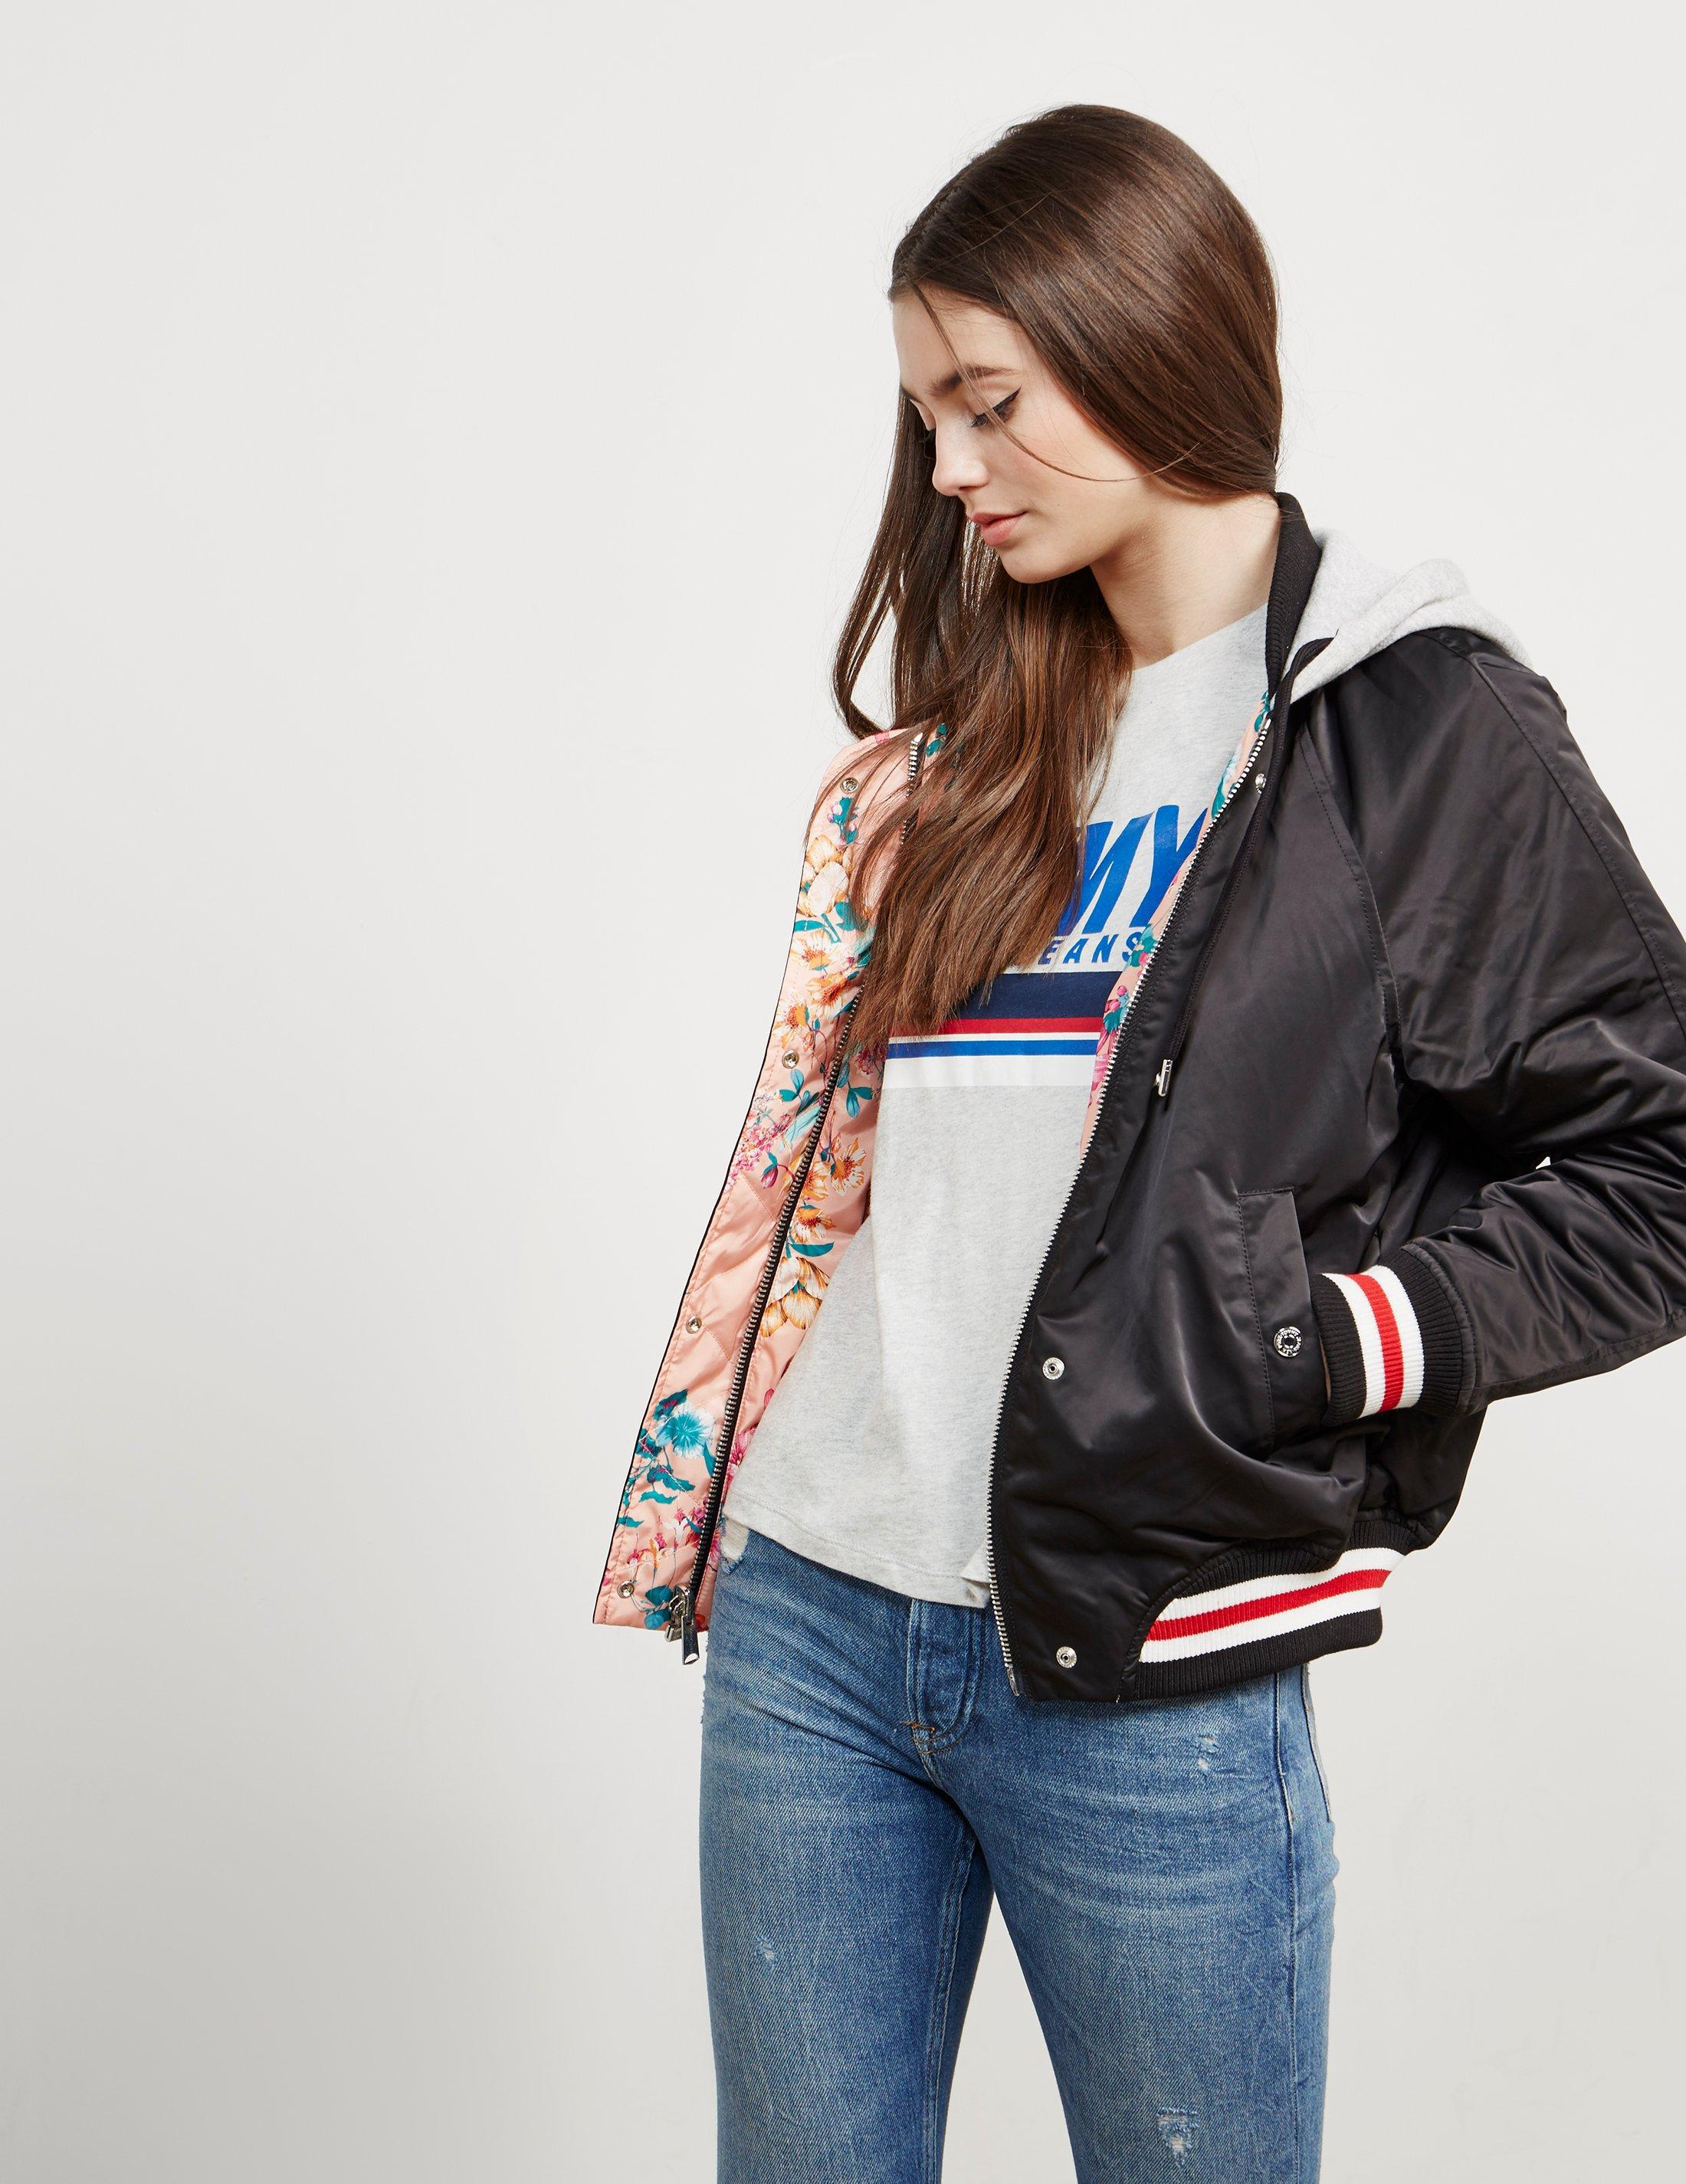 neue Season heiße neue Produkte spottbillig Womens Reverse Floral Hooded Jacket - Online Exclusive Black